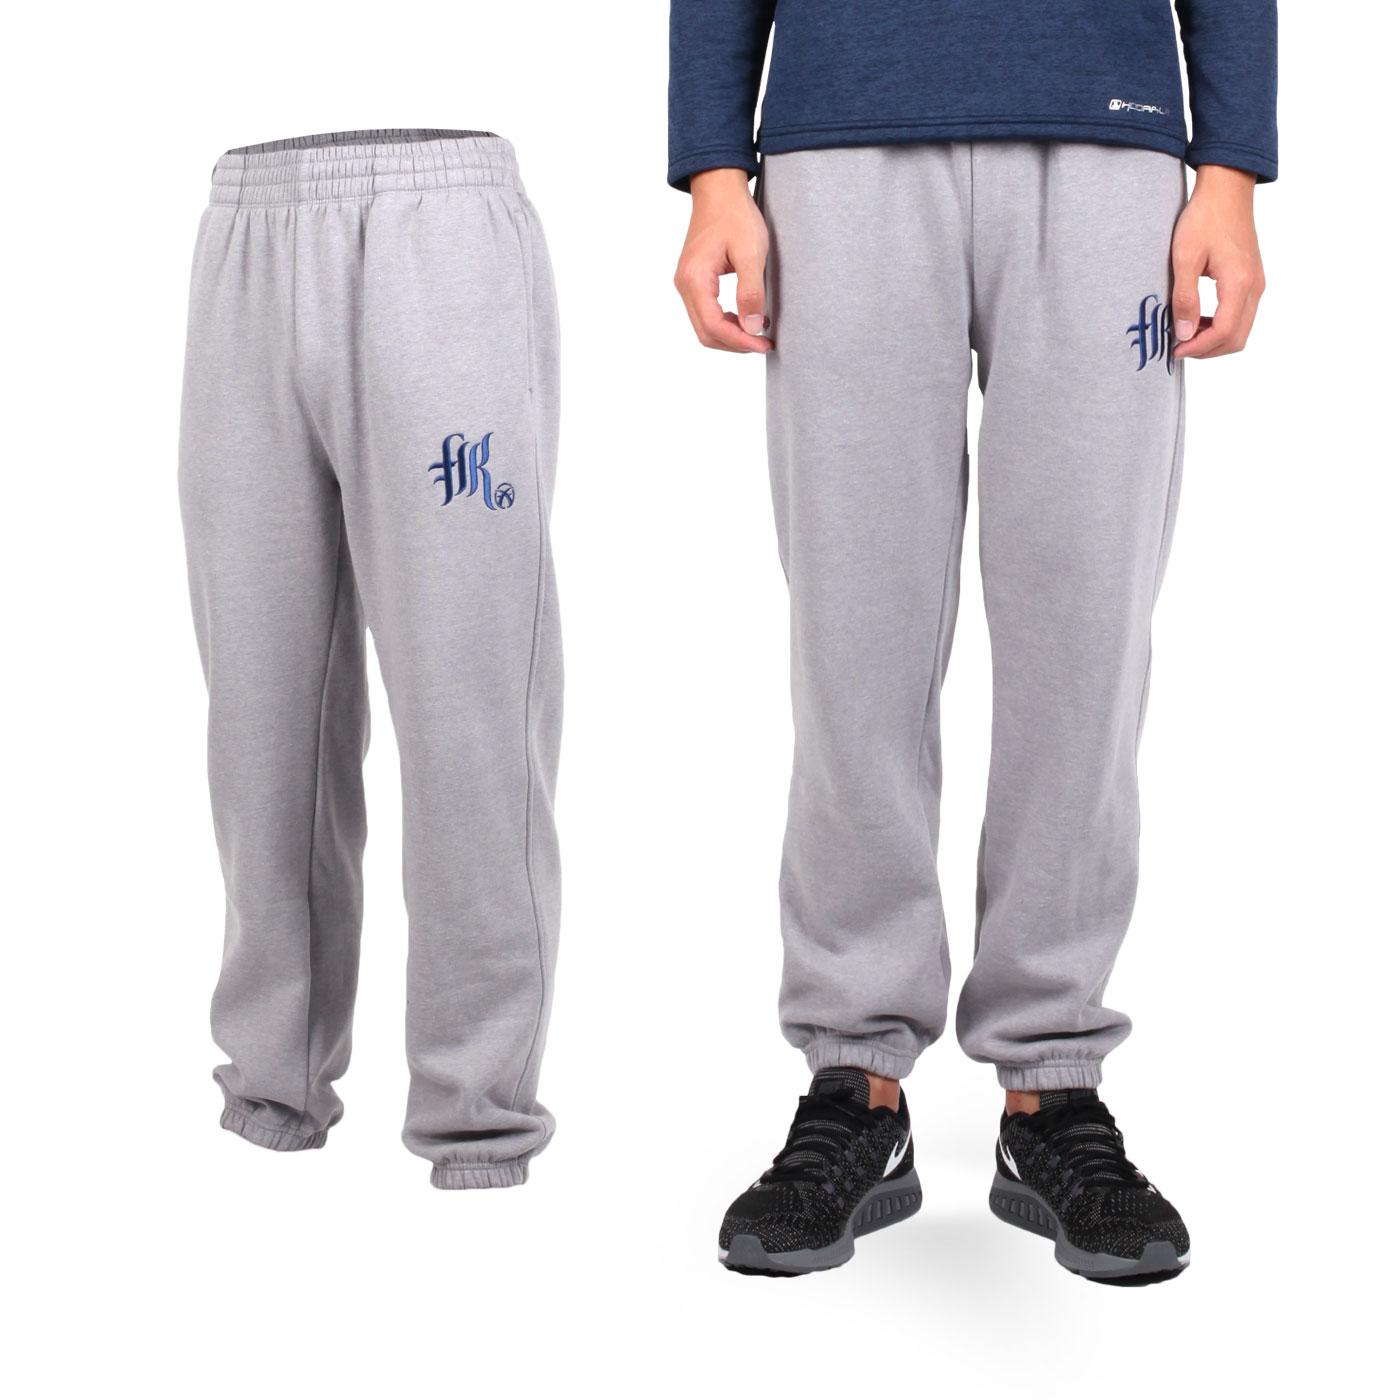 FIRESTAR 男款棉質內刷毛長褲 p5277-10 - 淺灰丈青